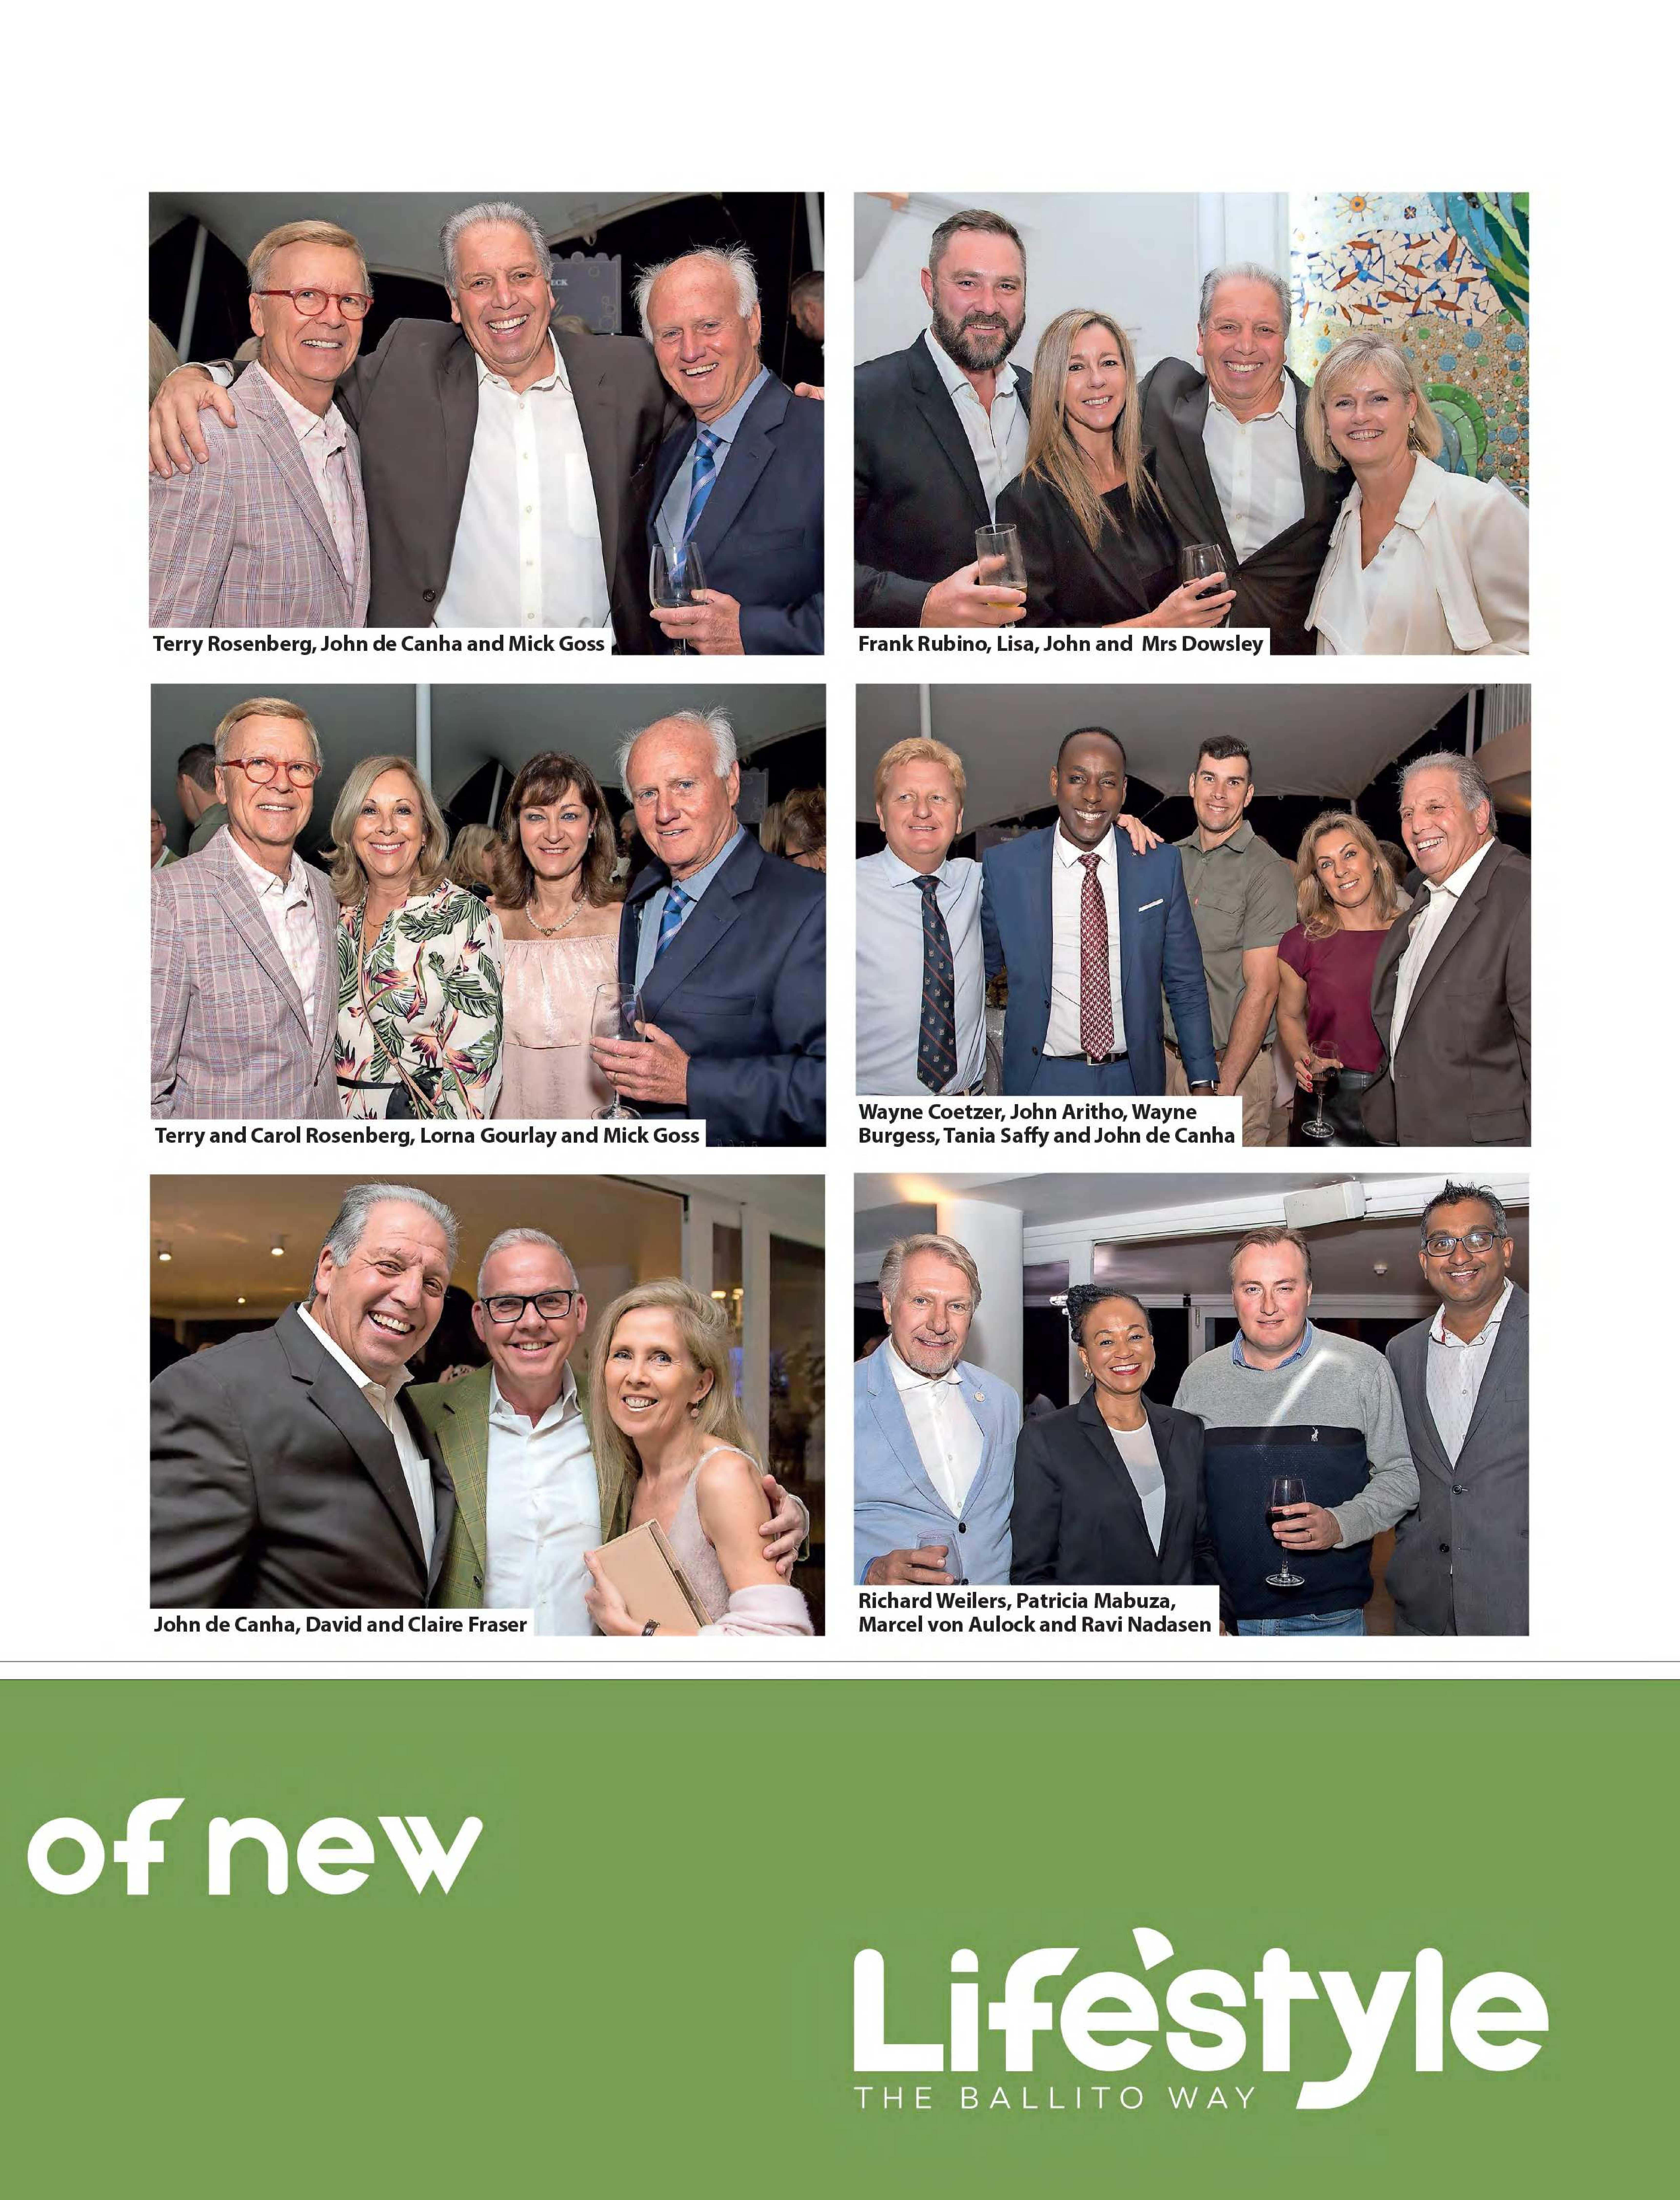 get-magazine-ballitoumhlanga-september-2018-epapers-page-11